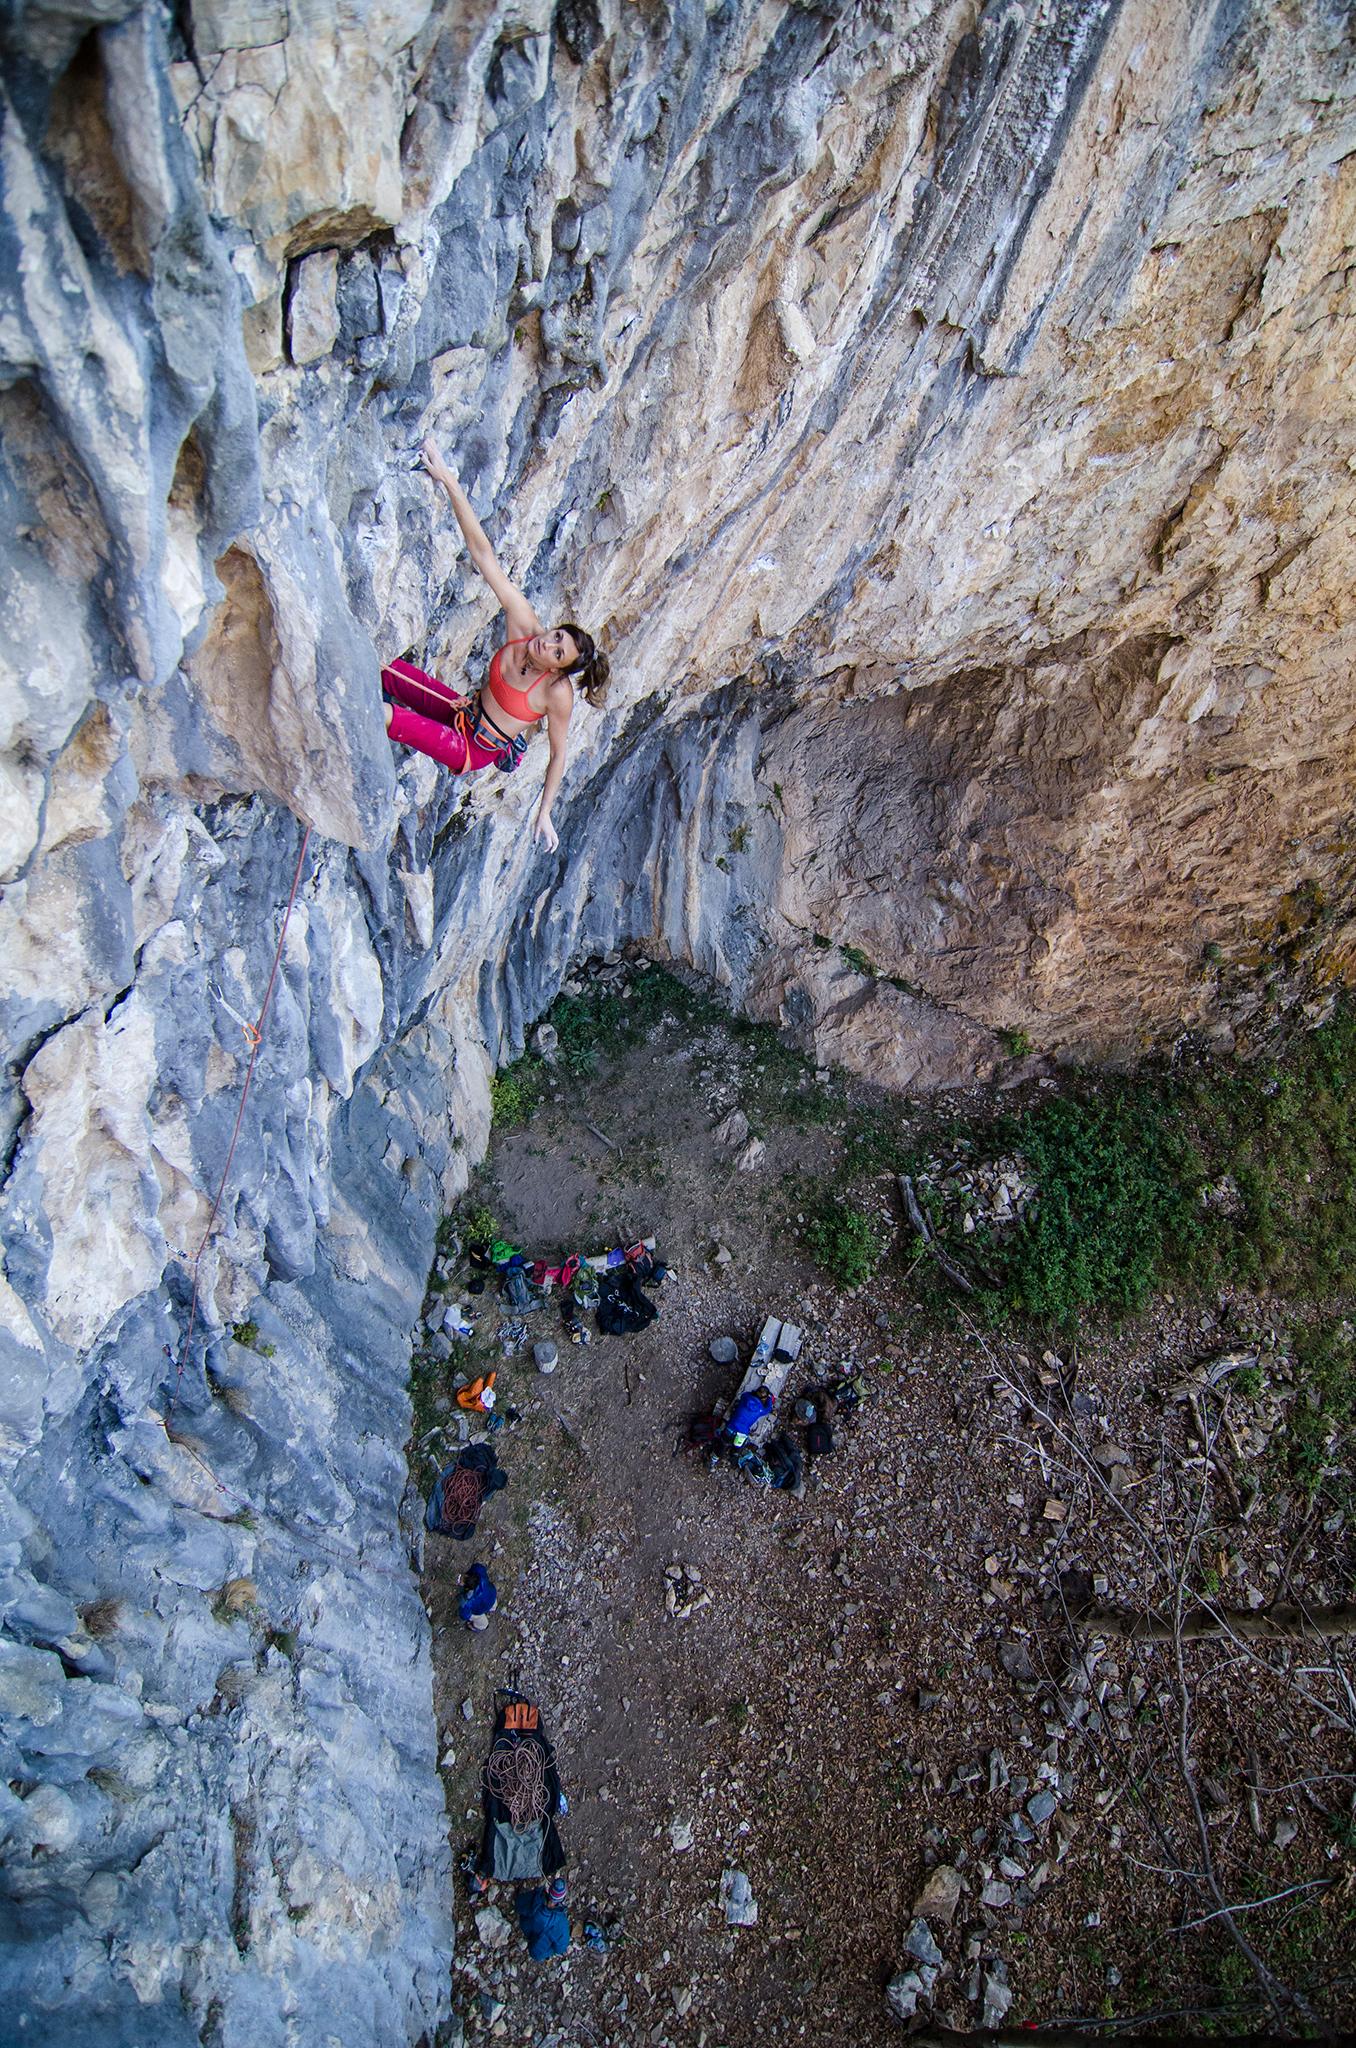 Rock climbing in Bulgaria at the Ribarista crag